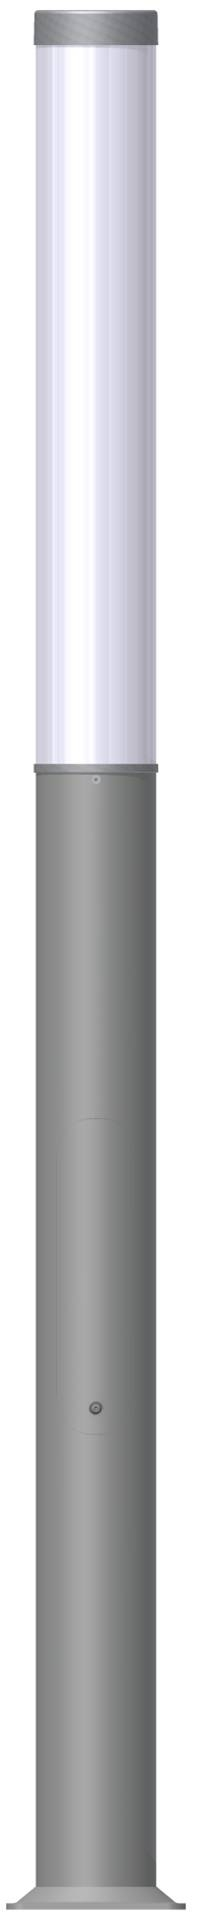 COLONNE LED KARIN 2400 LED